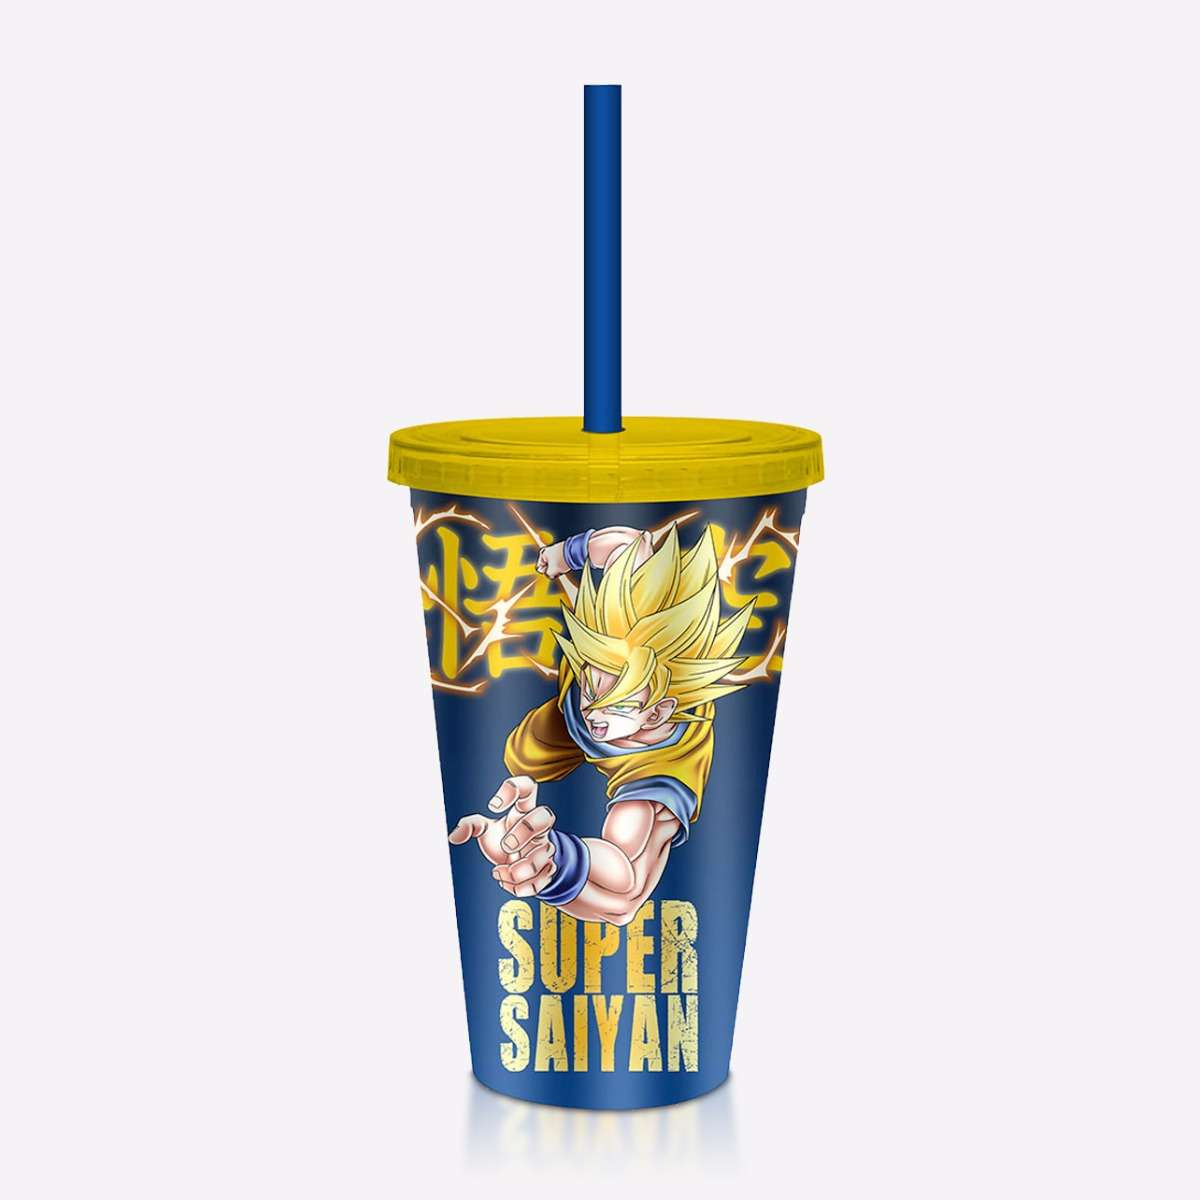 Plastic Carnival Cup accessories